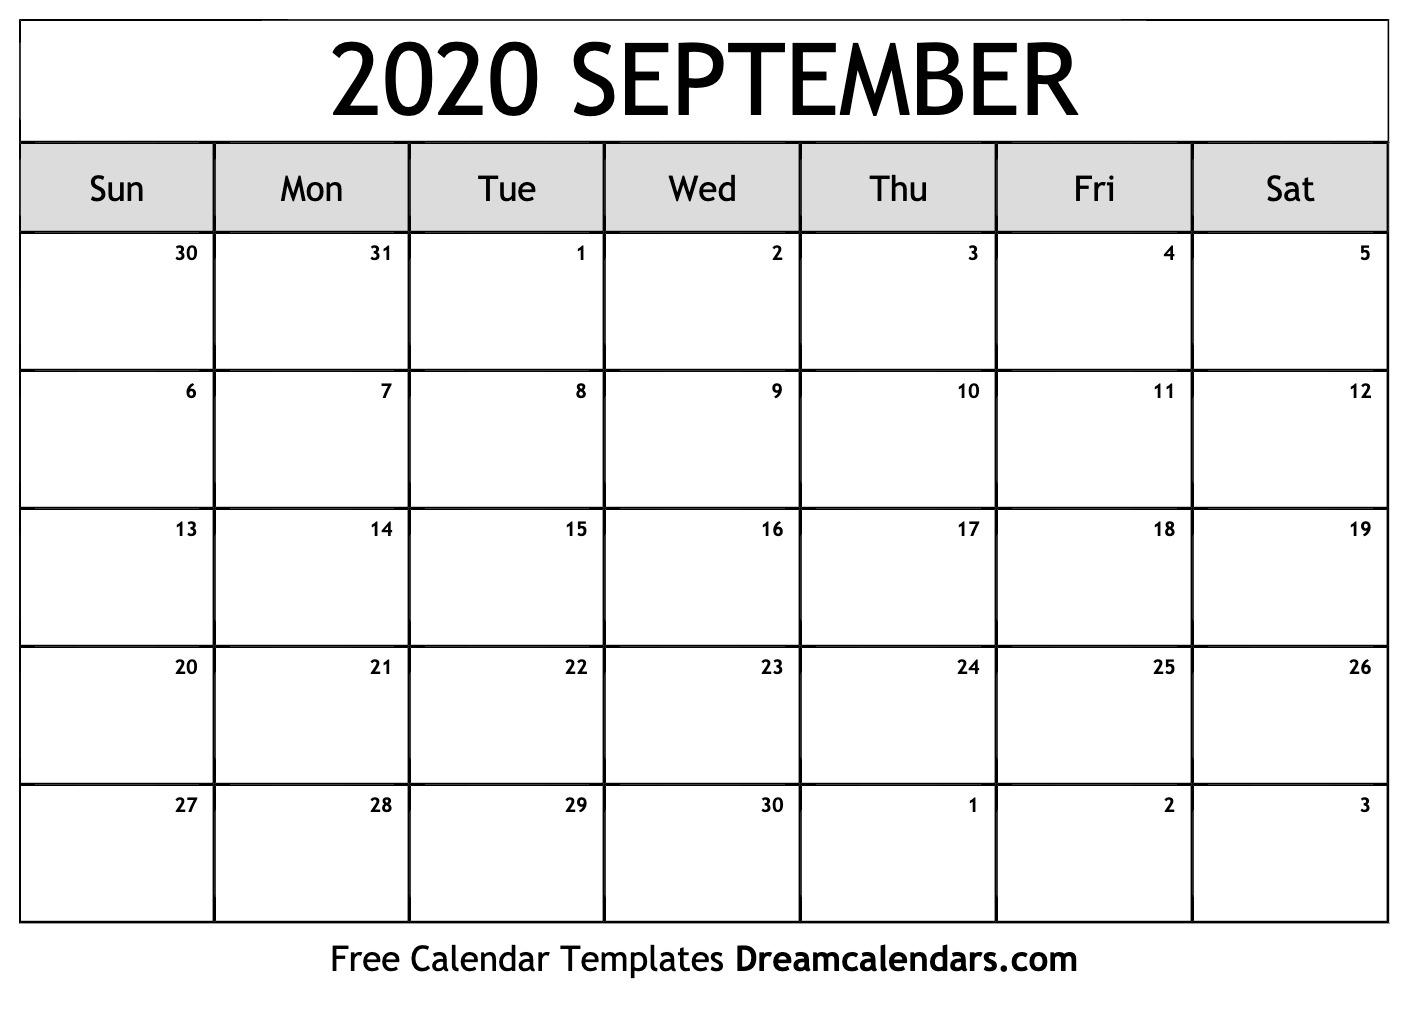 Printable September 2020 Calendar regarding Calendar September 2020 Start Monday Printable Free